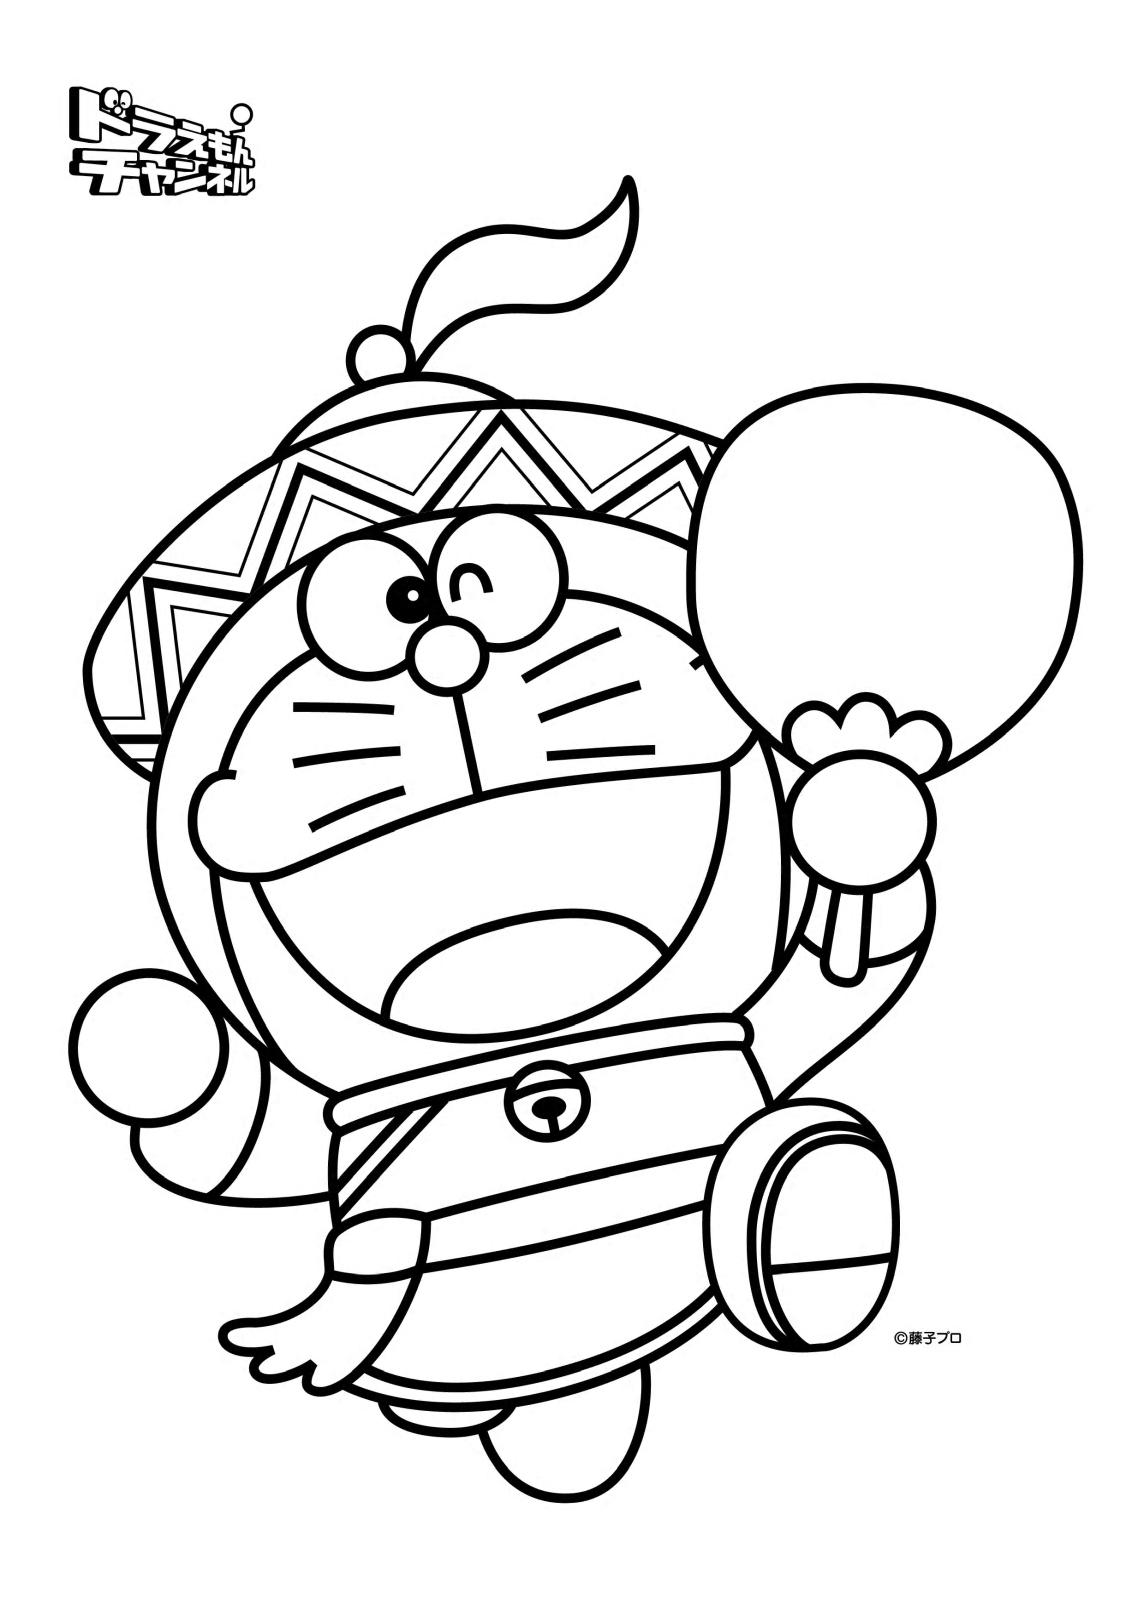 Doraemon Images For Coloring | Animaxwallpaper.com